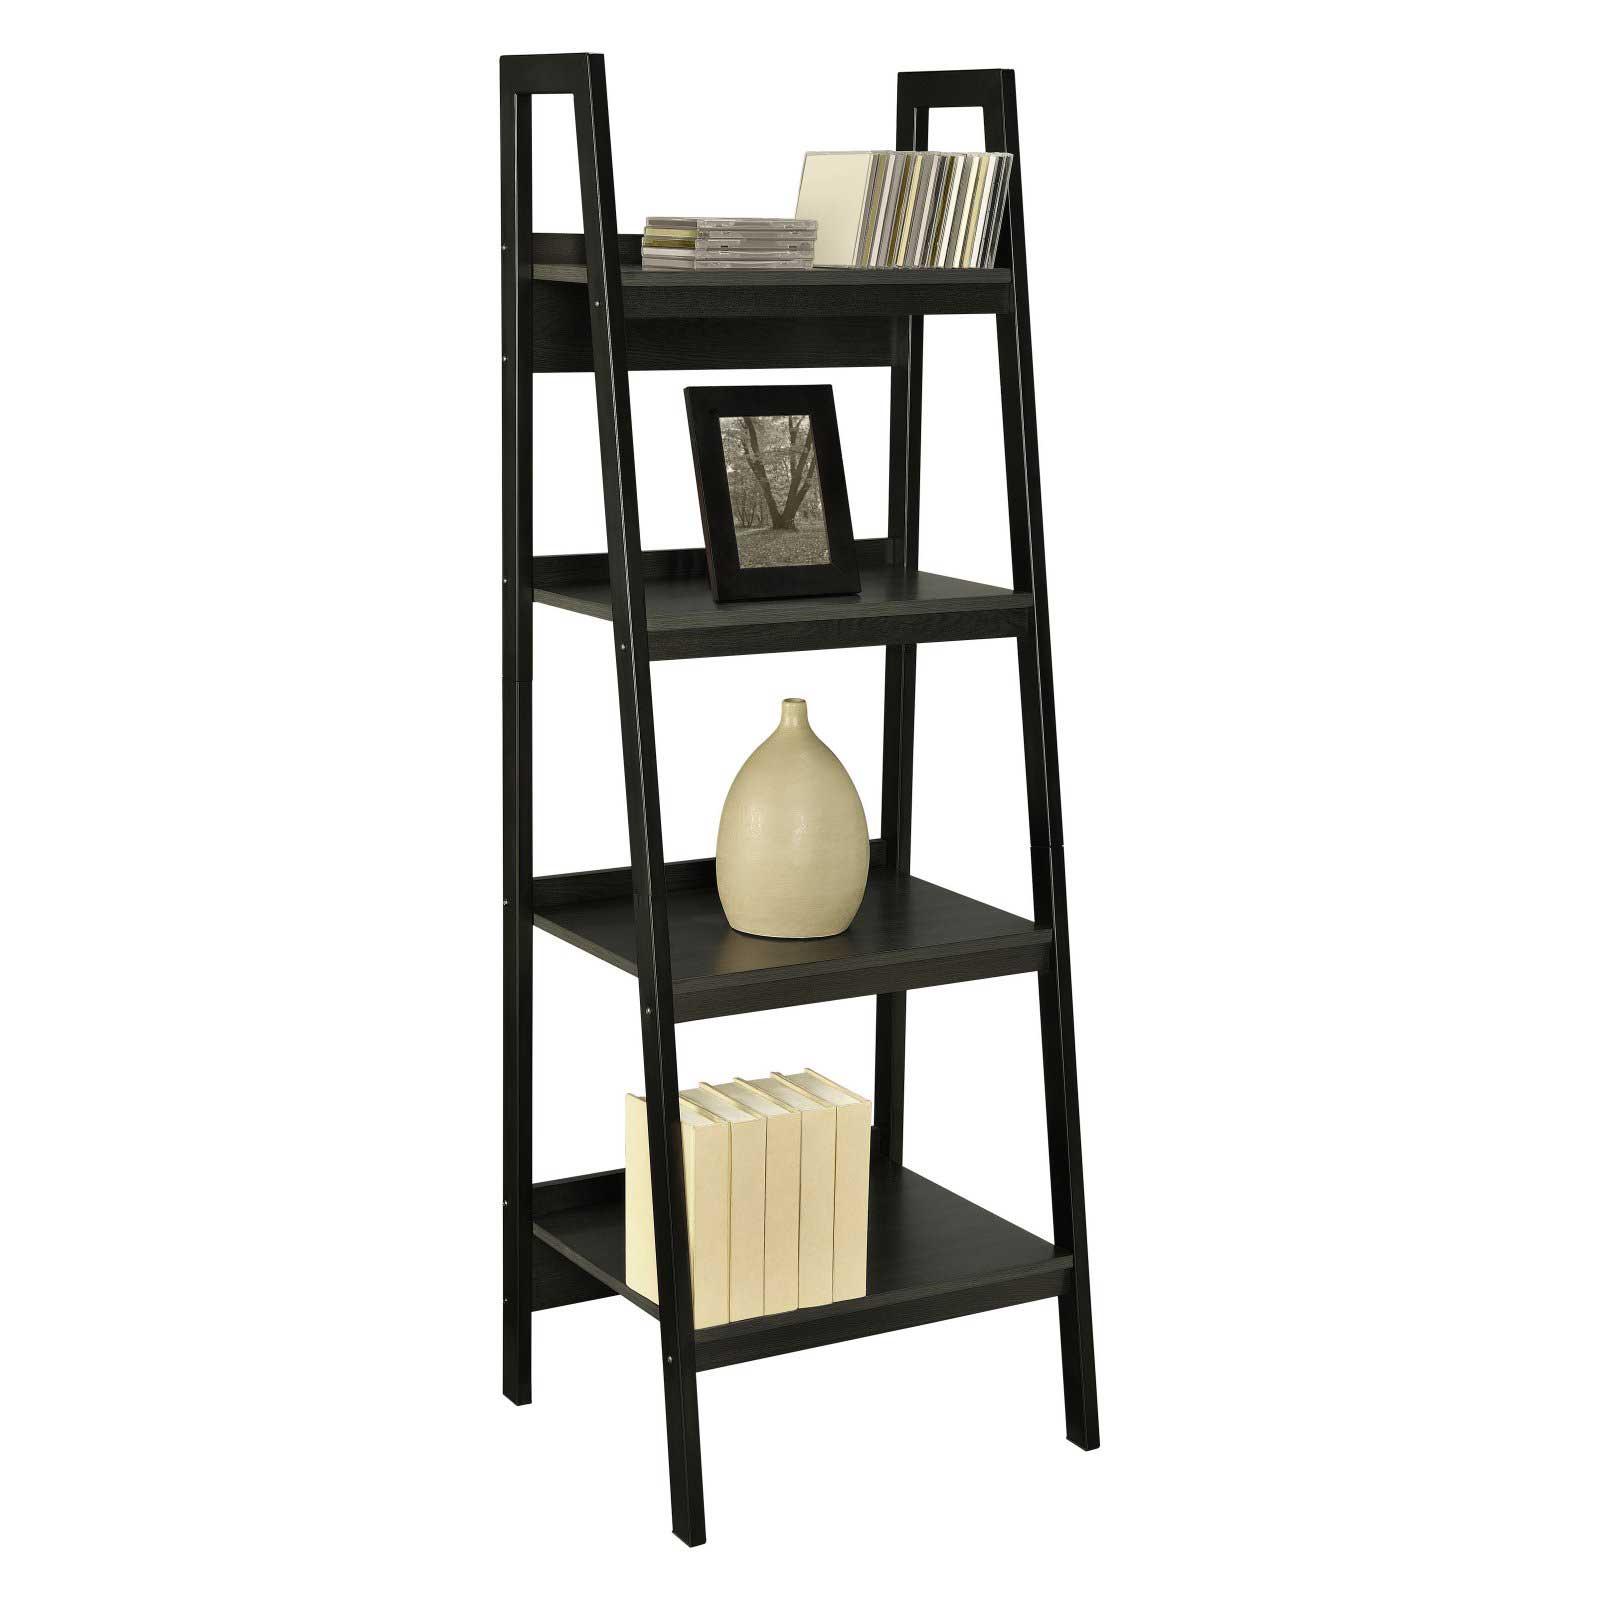 Plans To Build Leaning Ladder Bookshelf Plans Pdf Plans